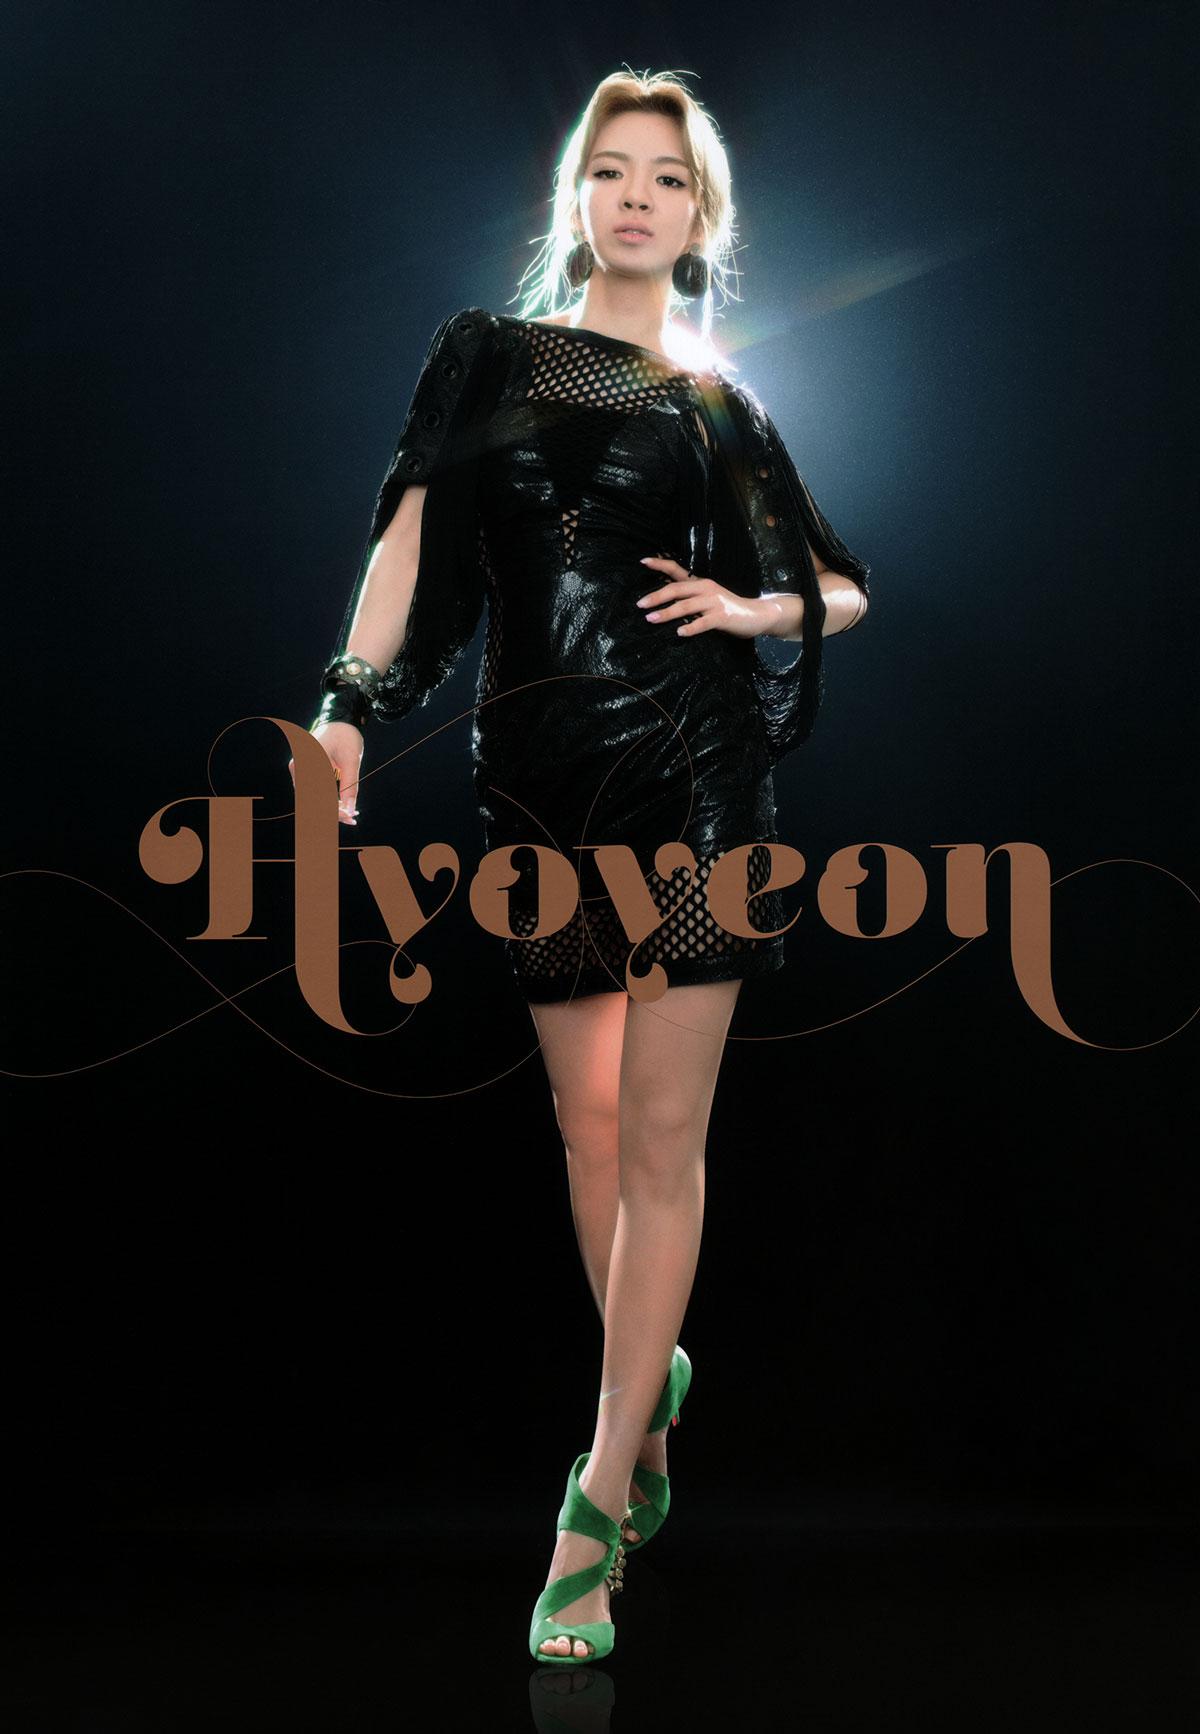 Hyoyeon Girls Generation 2011 Tour brochure